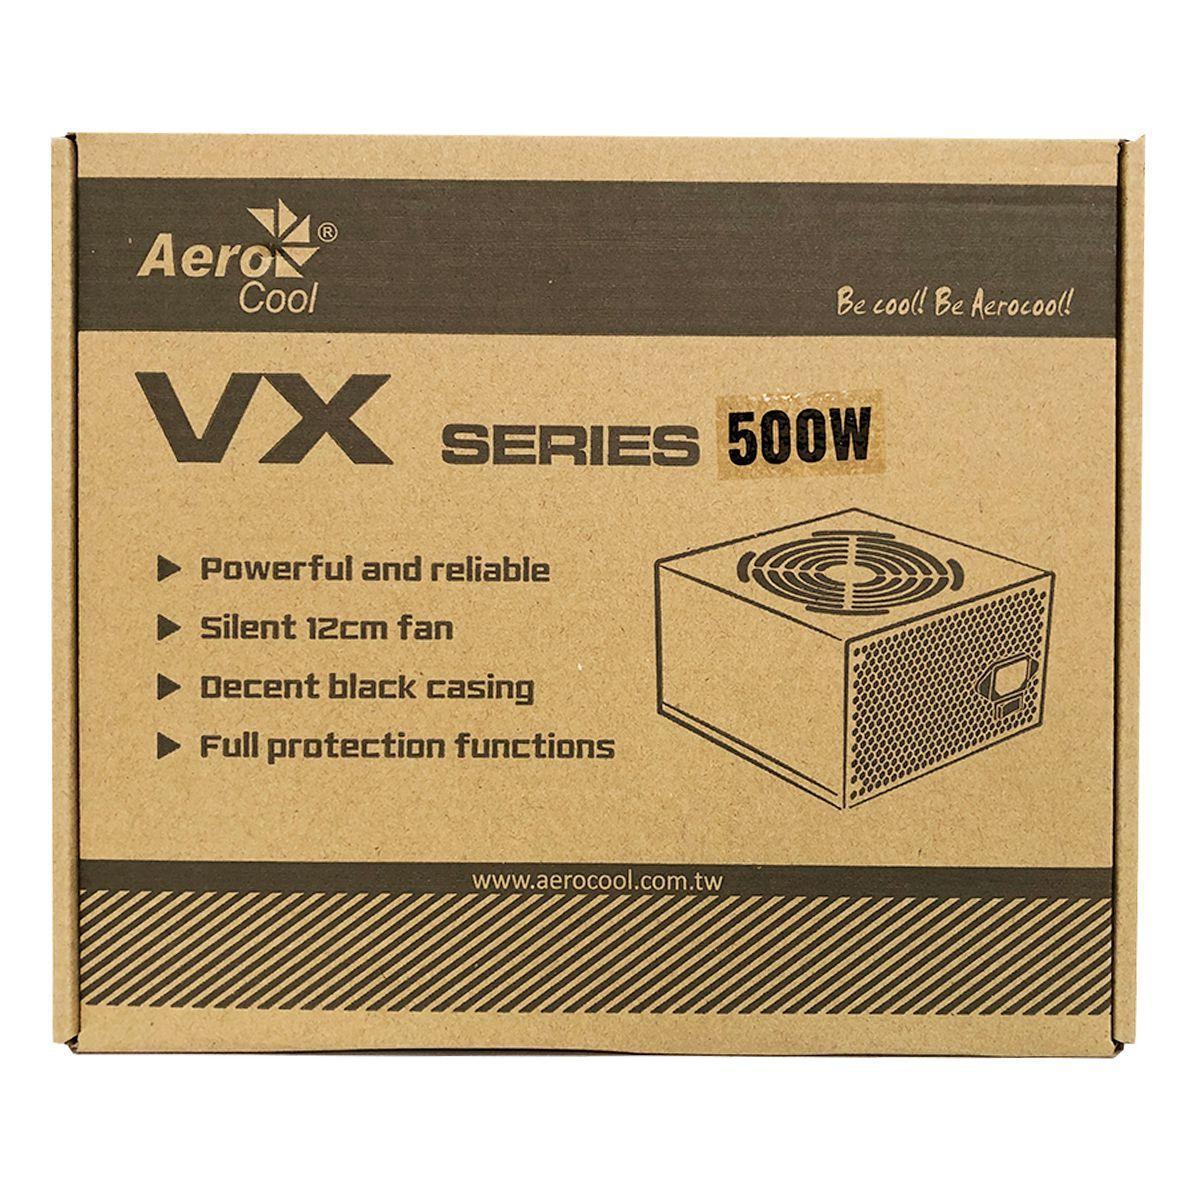 FONTE ALIMENTACAO ATX AEROCOOL 500W VX-500 C/CAIXA S/CABO BIVOLT CHAVEADA